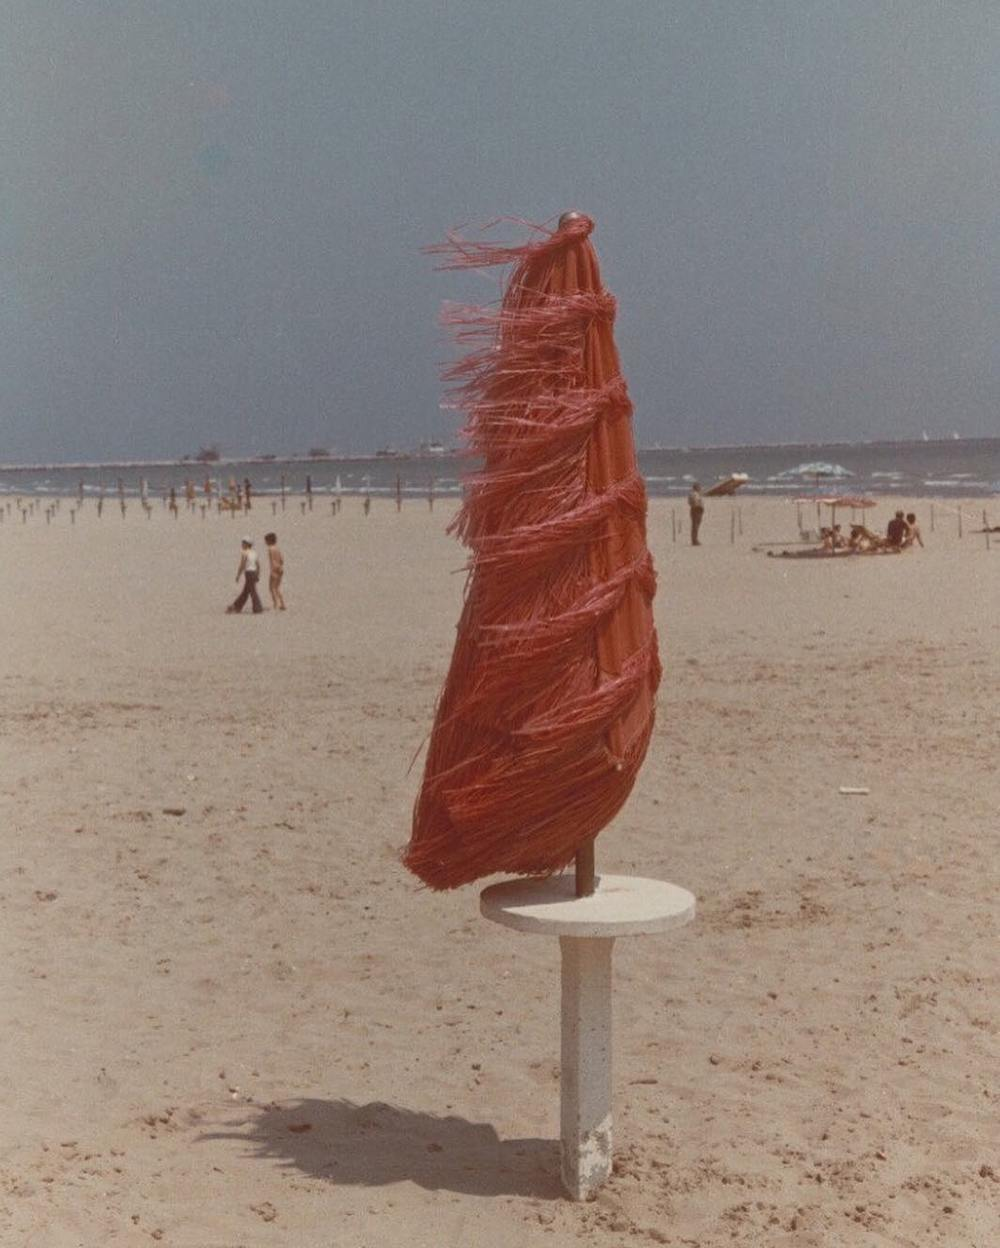 Marina di Ravenna by Luigi Ghirri, '72